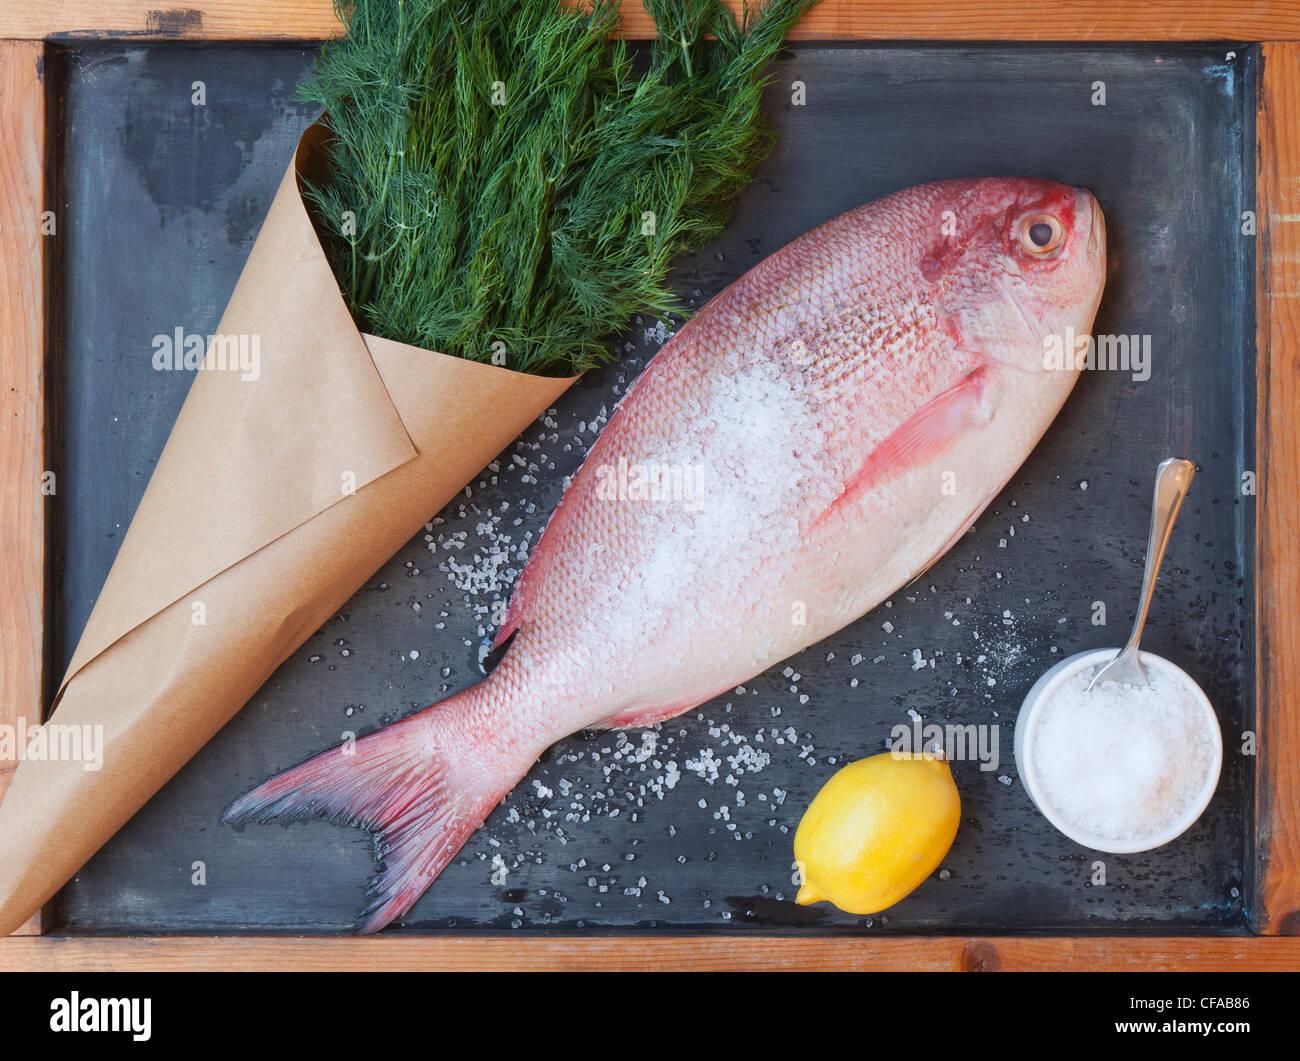 Red snapper, lemon, greens and salt - Stock Photo